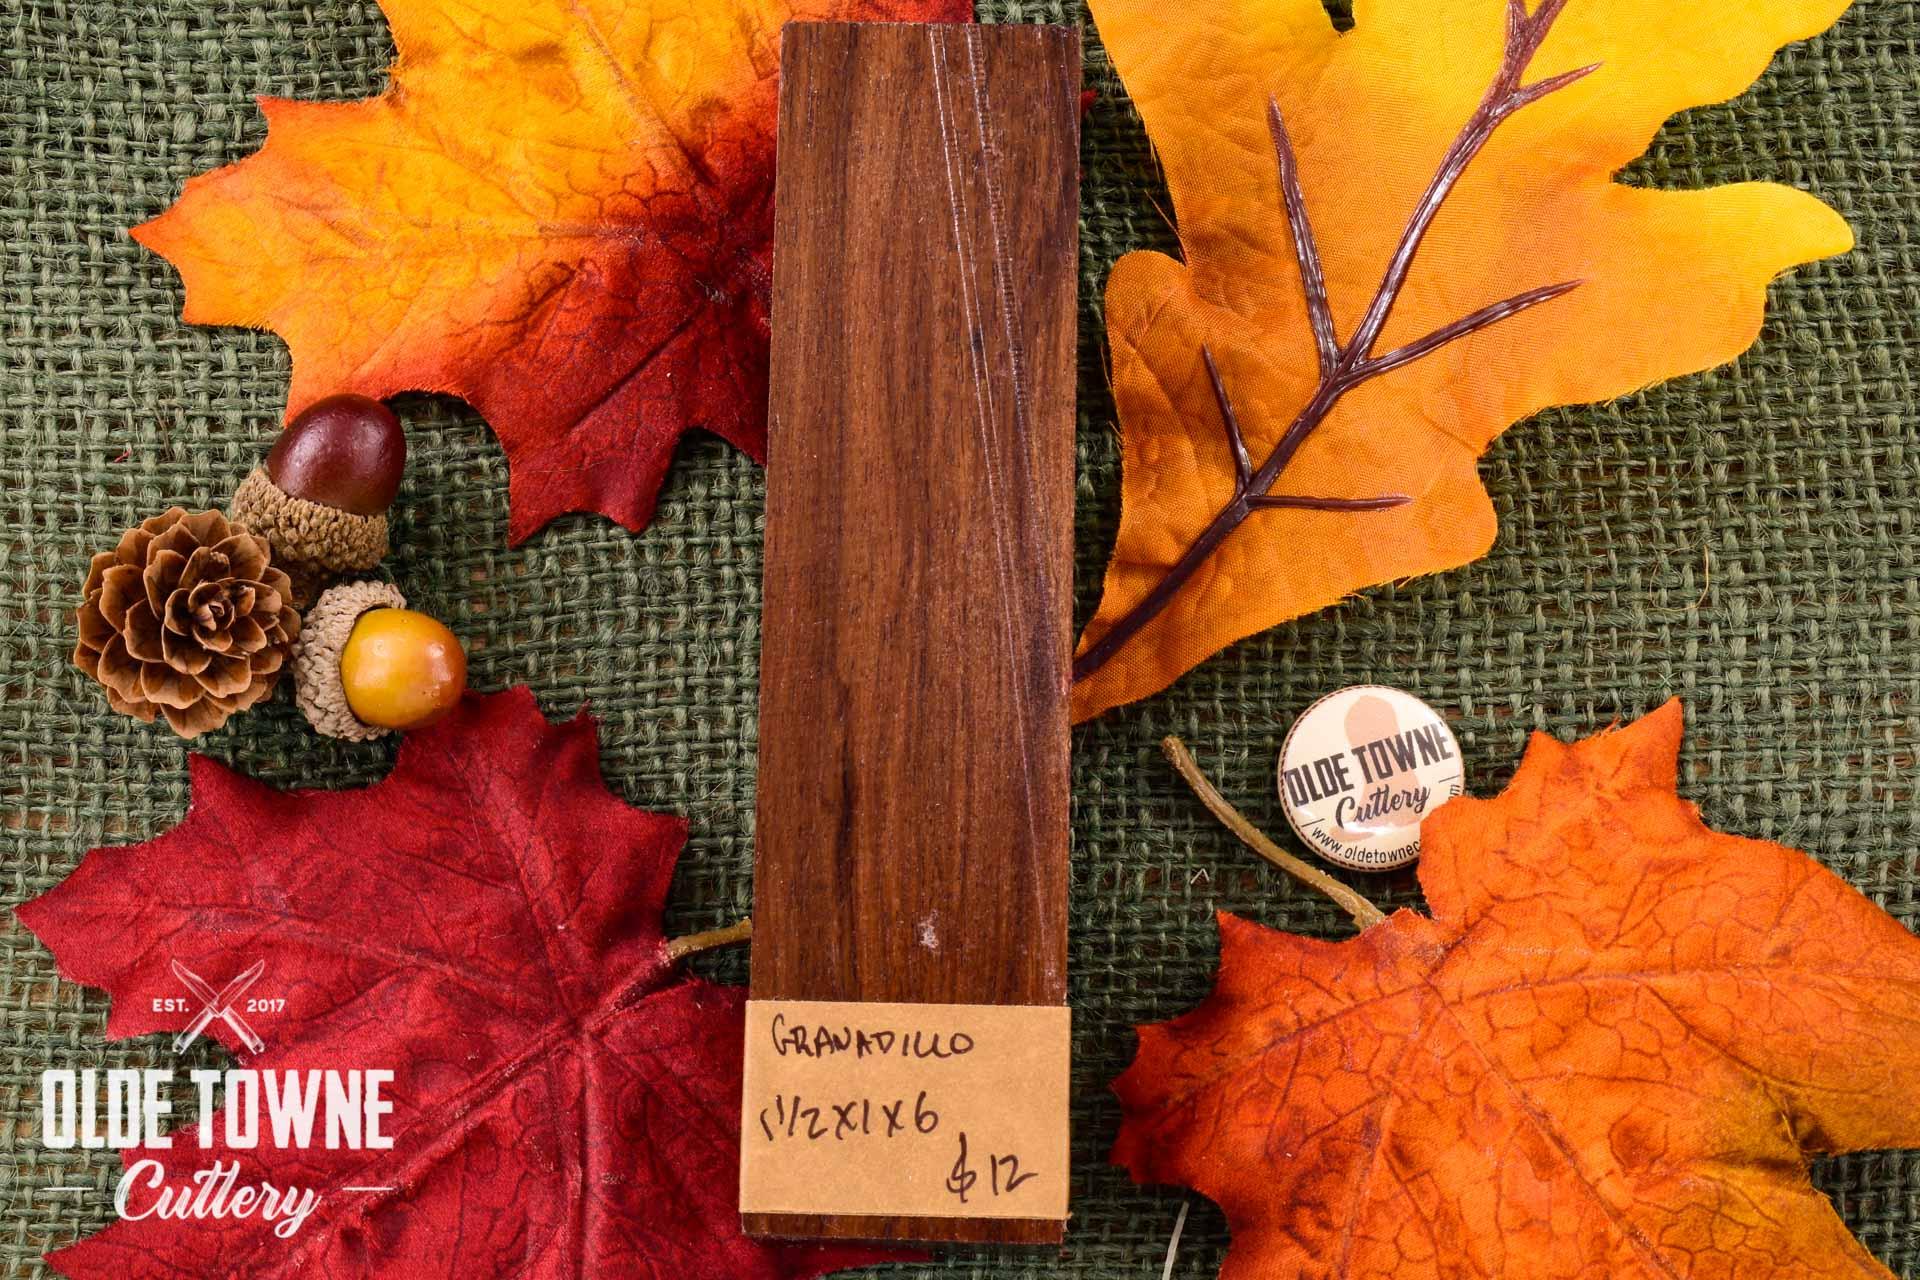 Handle Material Granadillo 1 1/2 x 1 x 6 Block